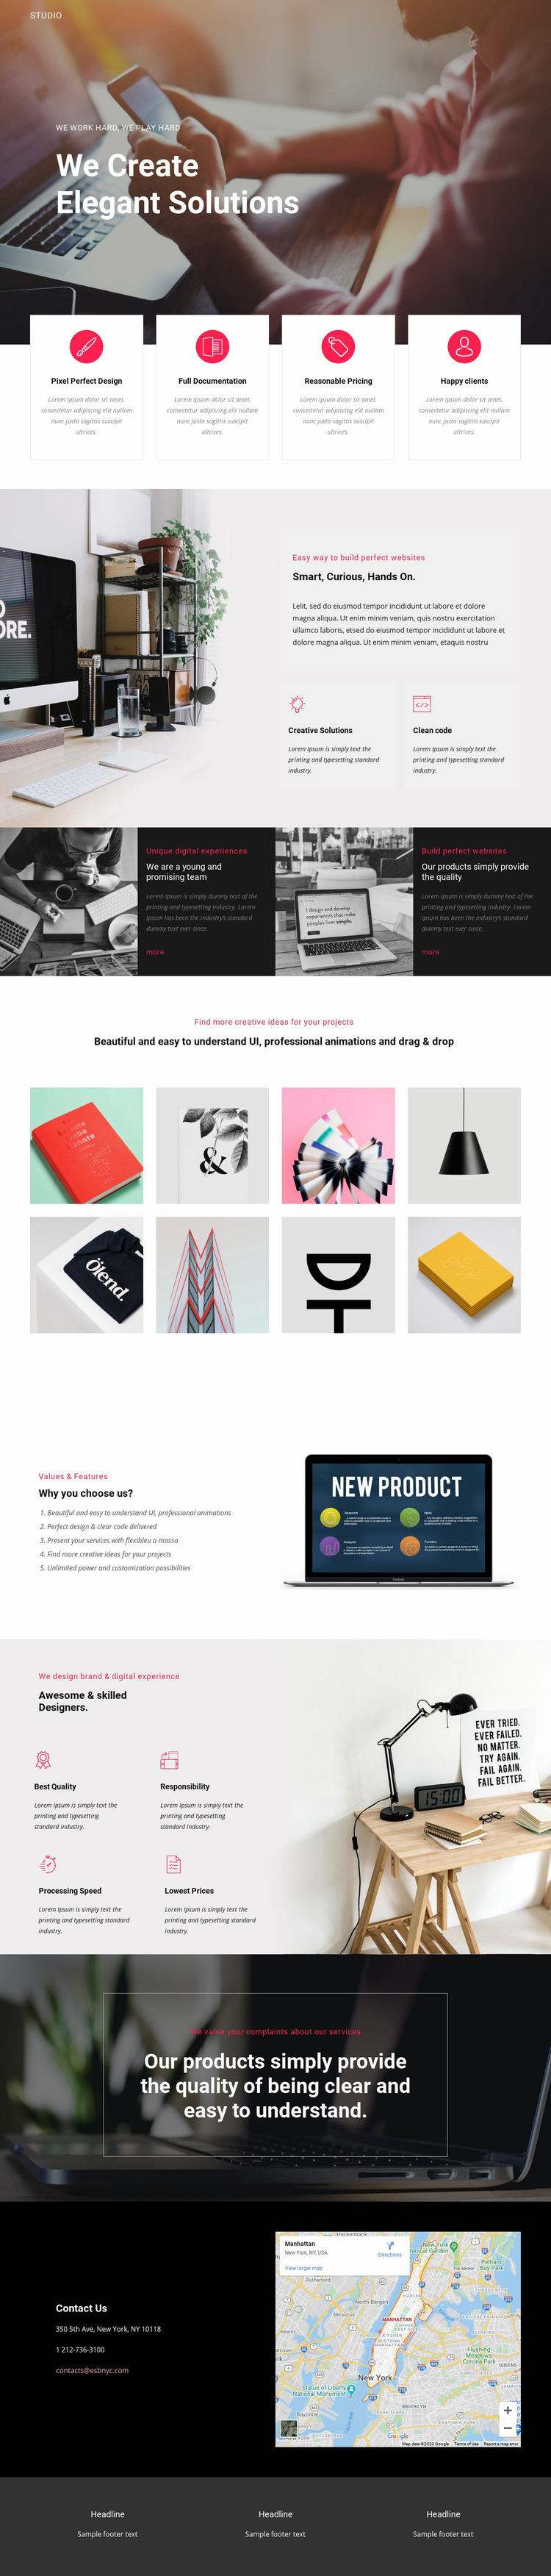 Elegant solutions in business  Web Page Designer